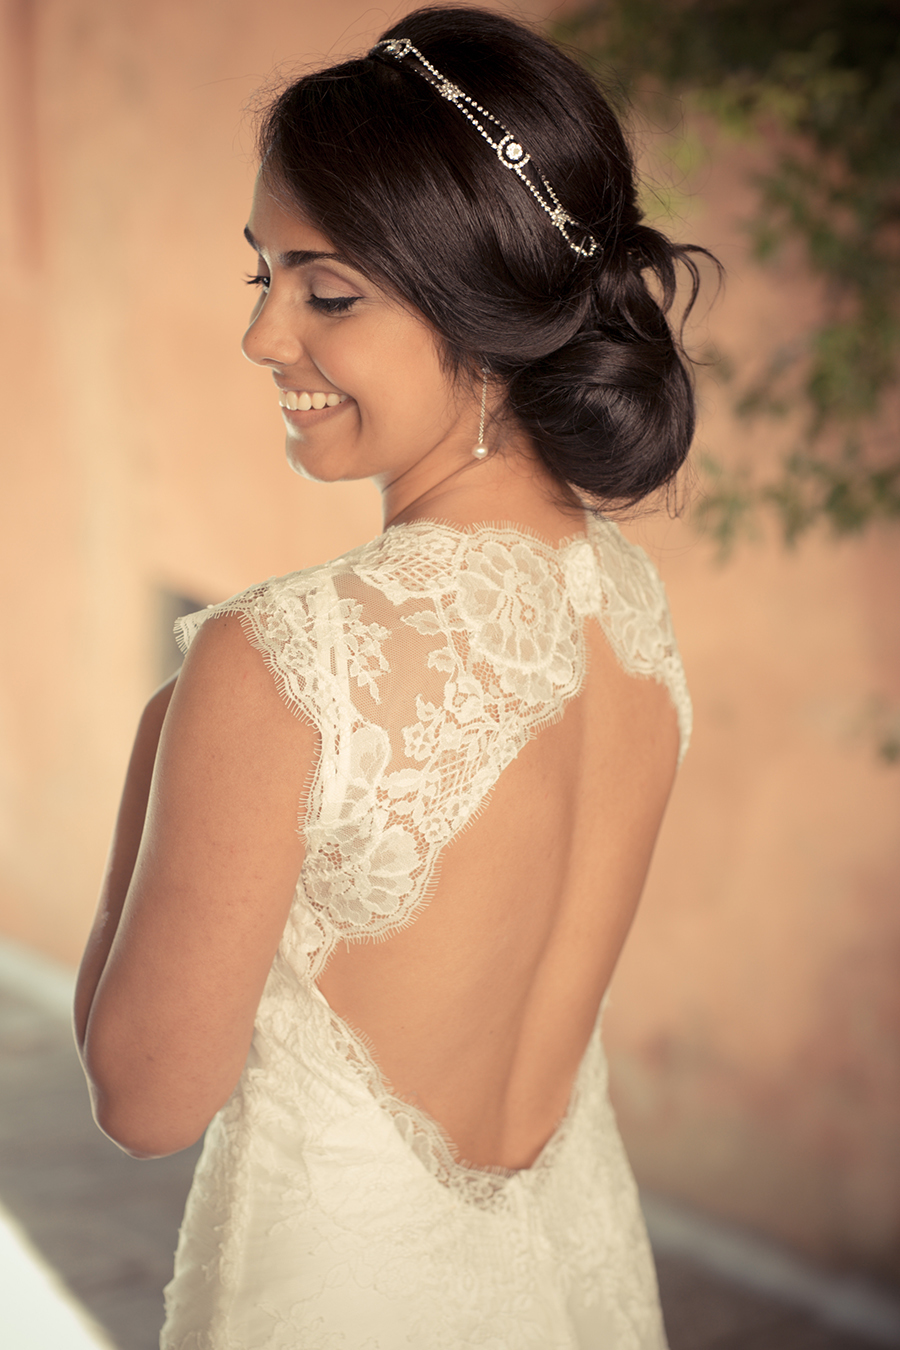 02 :: Romantic Jewish Wedding :: Luxury wedding photography - 2 :: 02